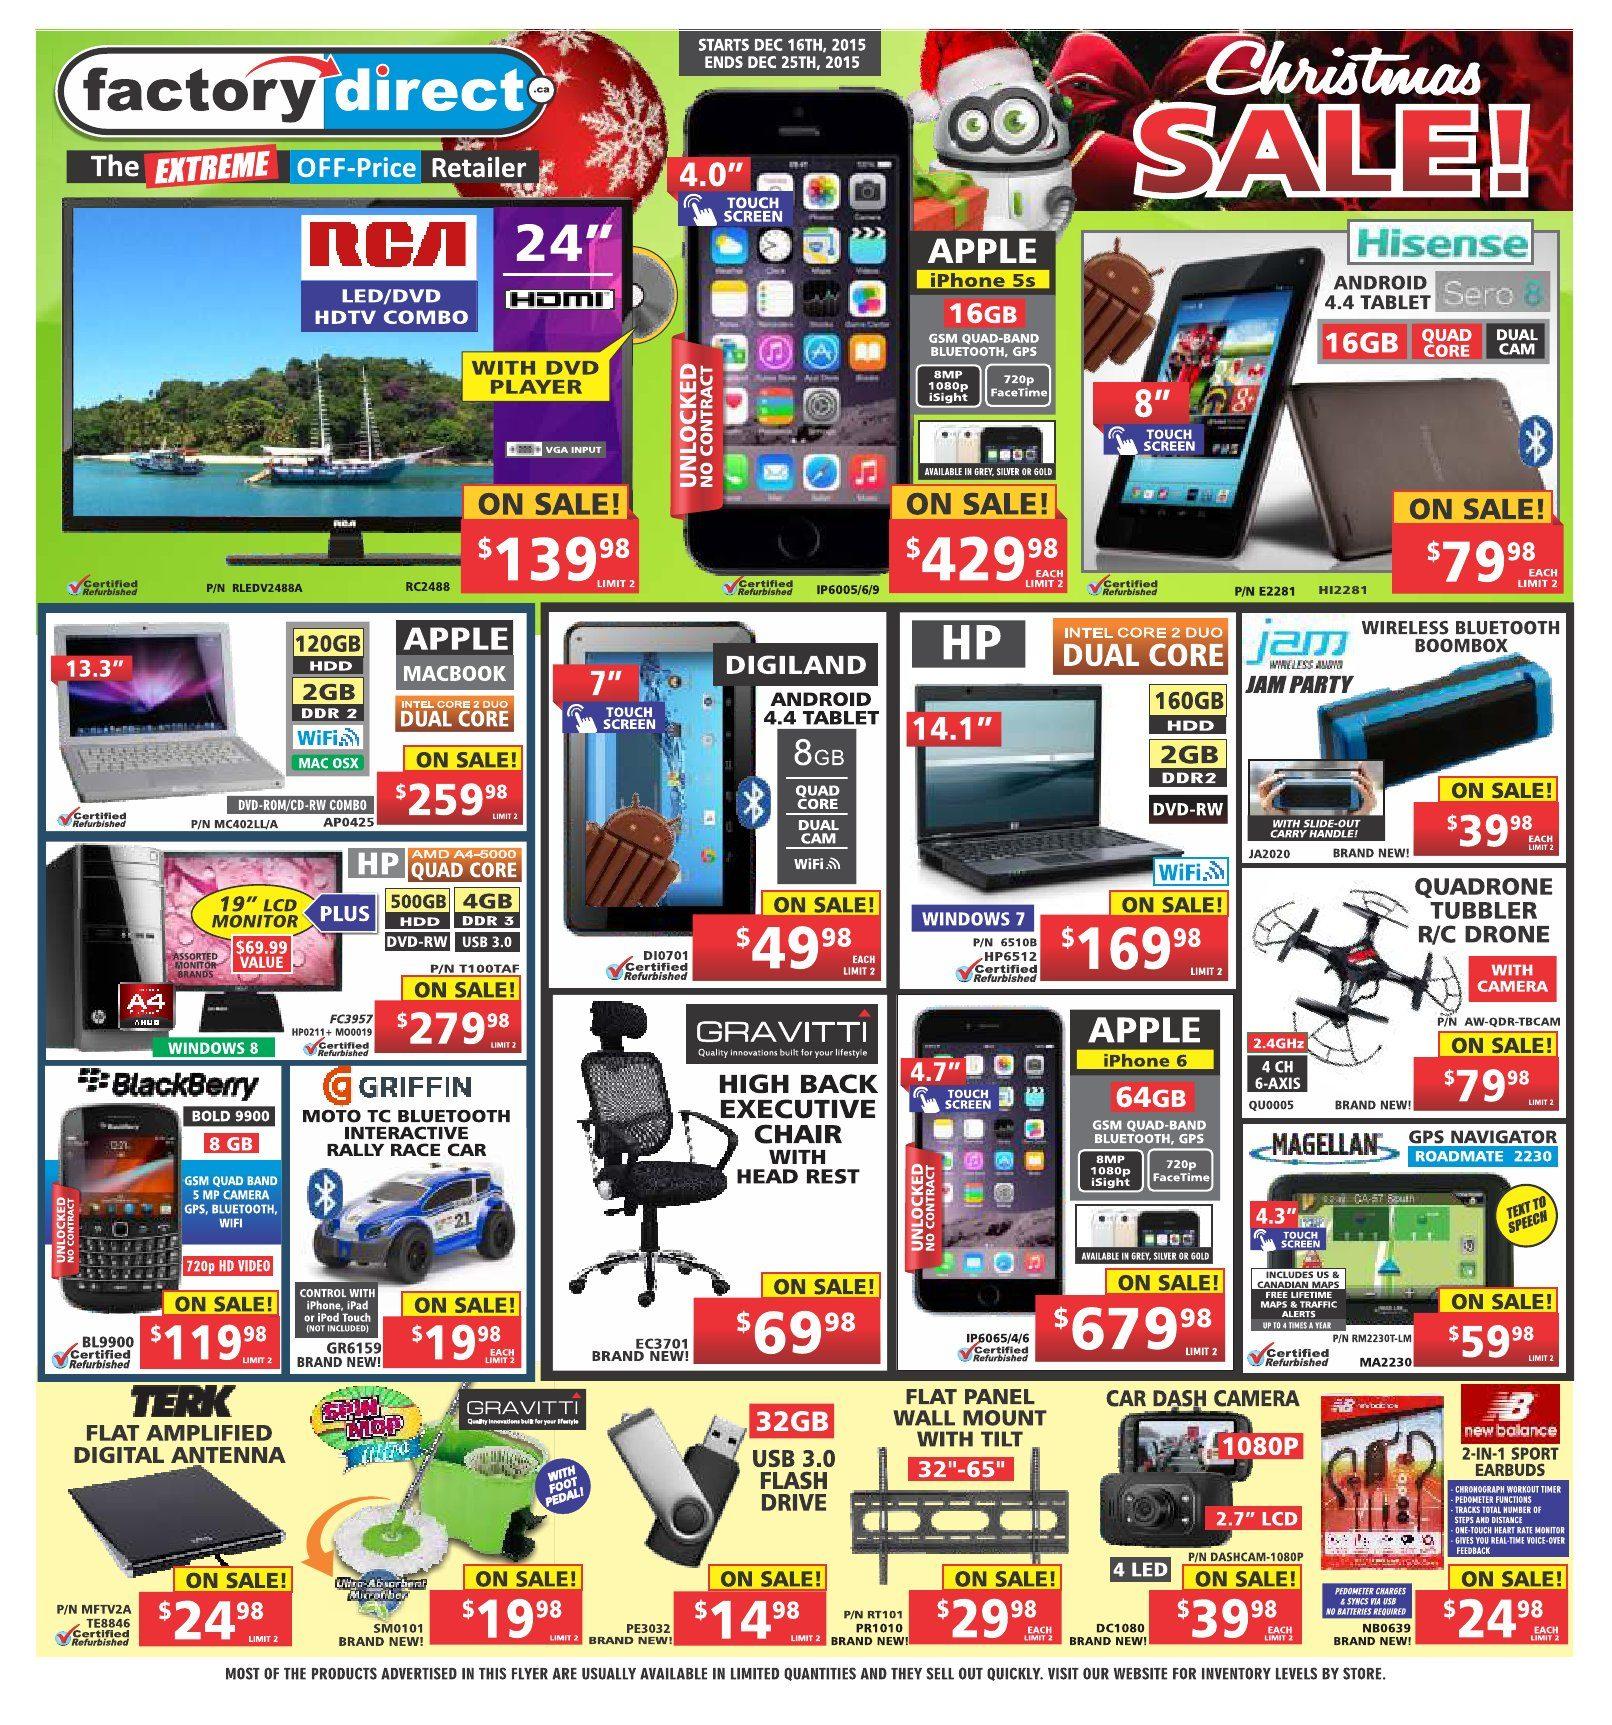 Factory Direct Weekly Flyer - Weekly - Christmas Sale! (EN